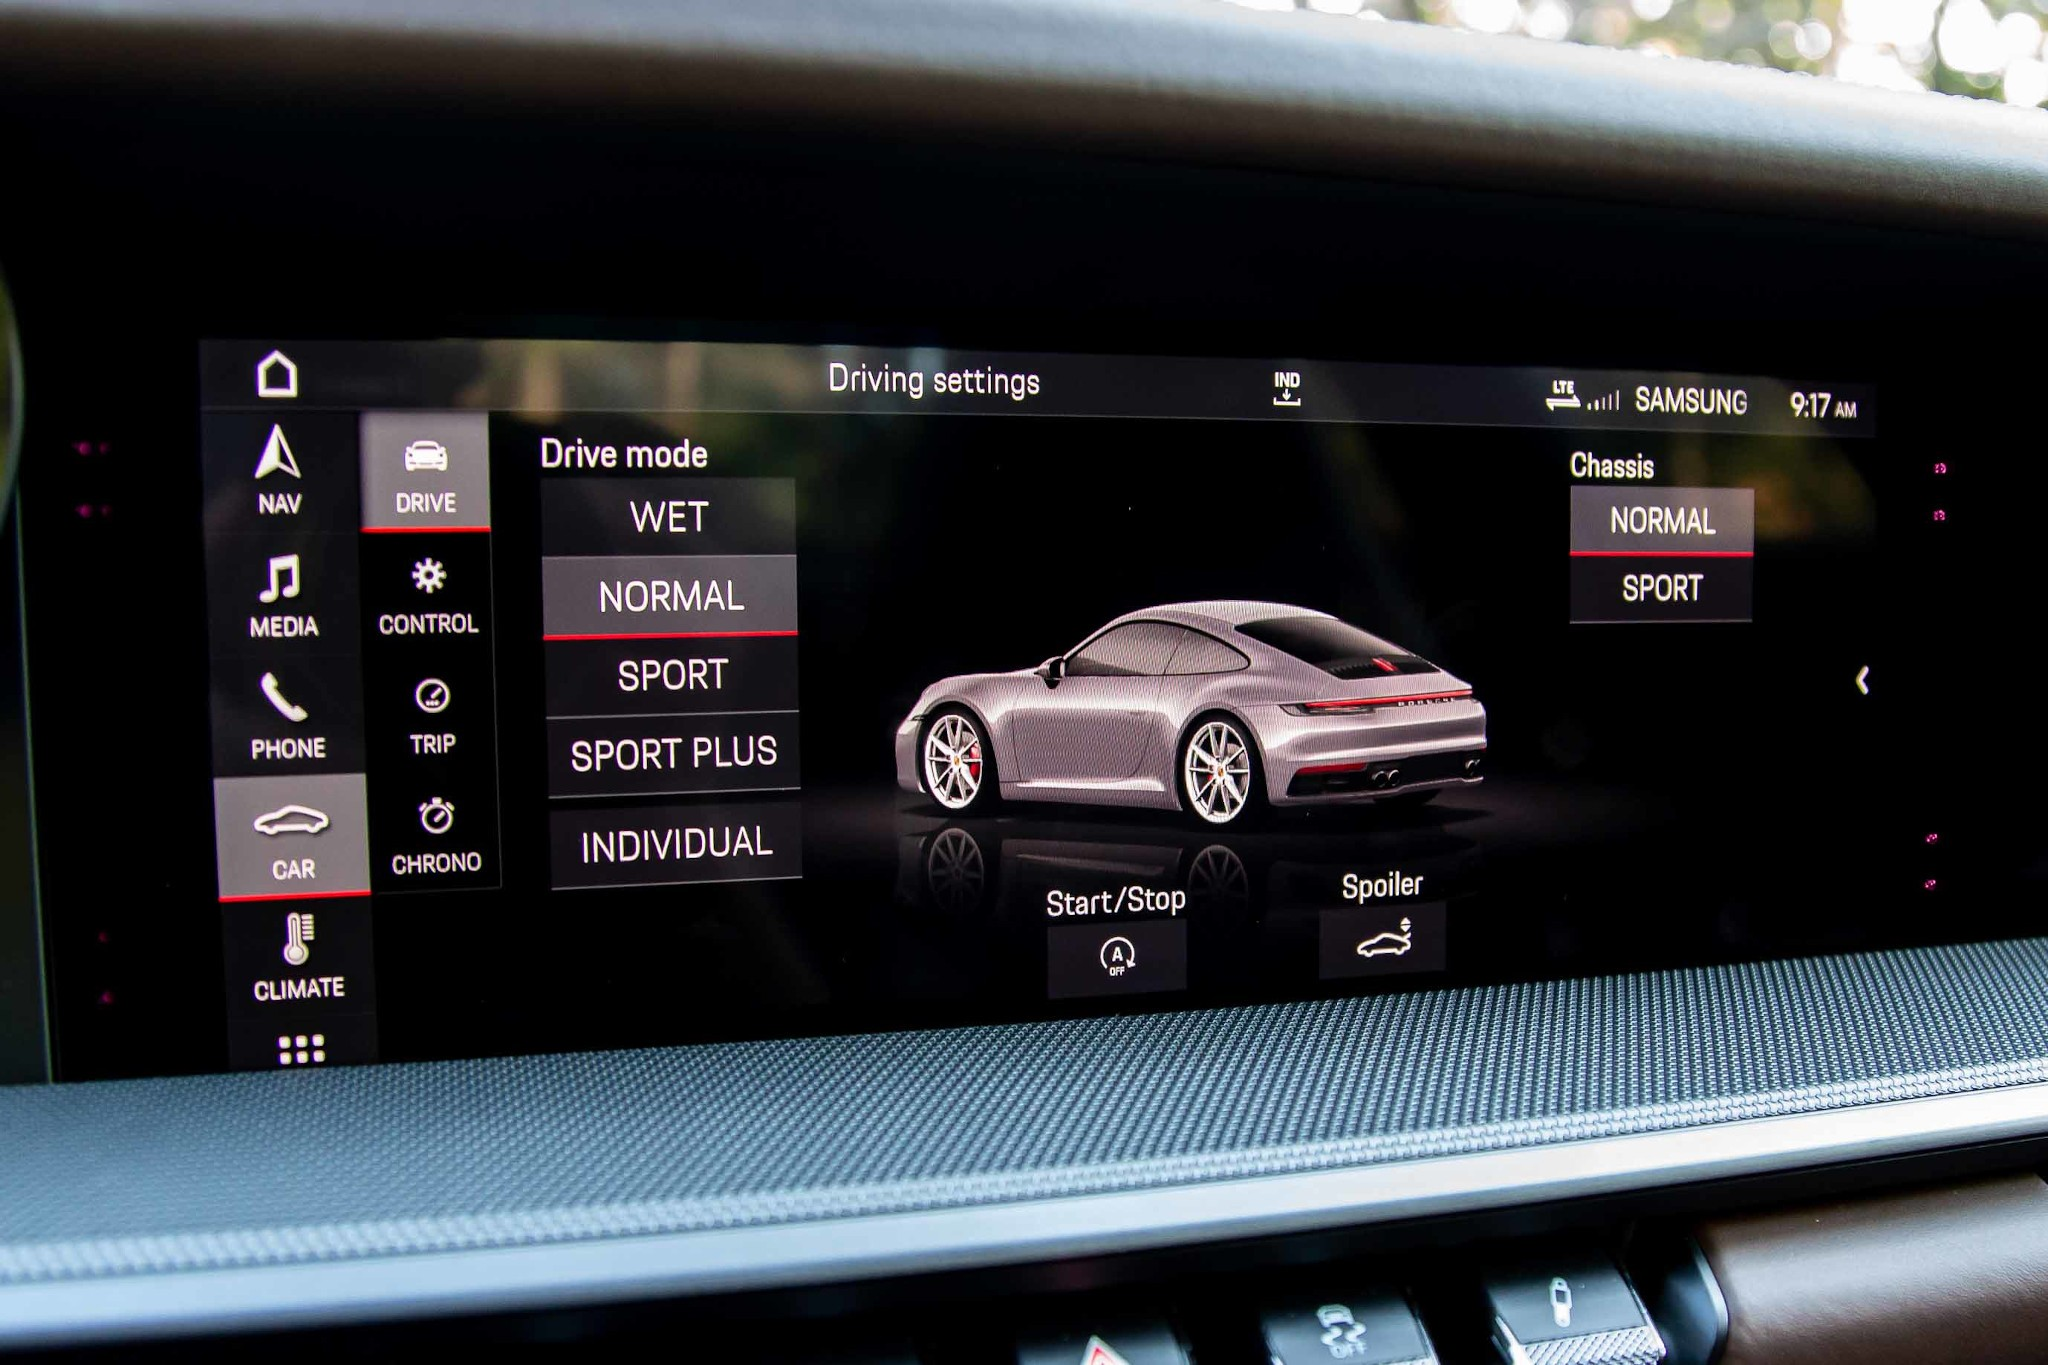 porsche-911-carrera-2020-24-center-stack-display--drive-mode--front-row--interior.jpg